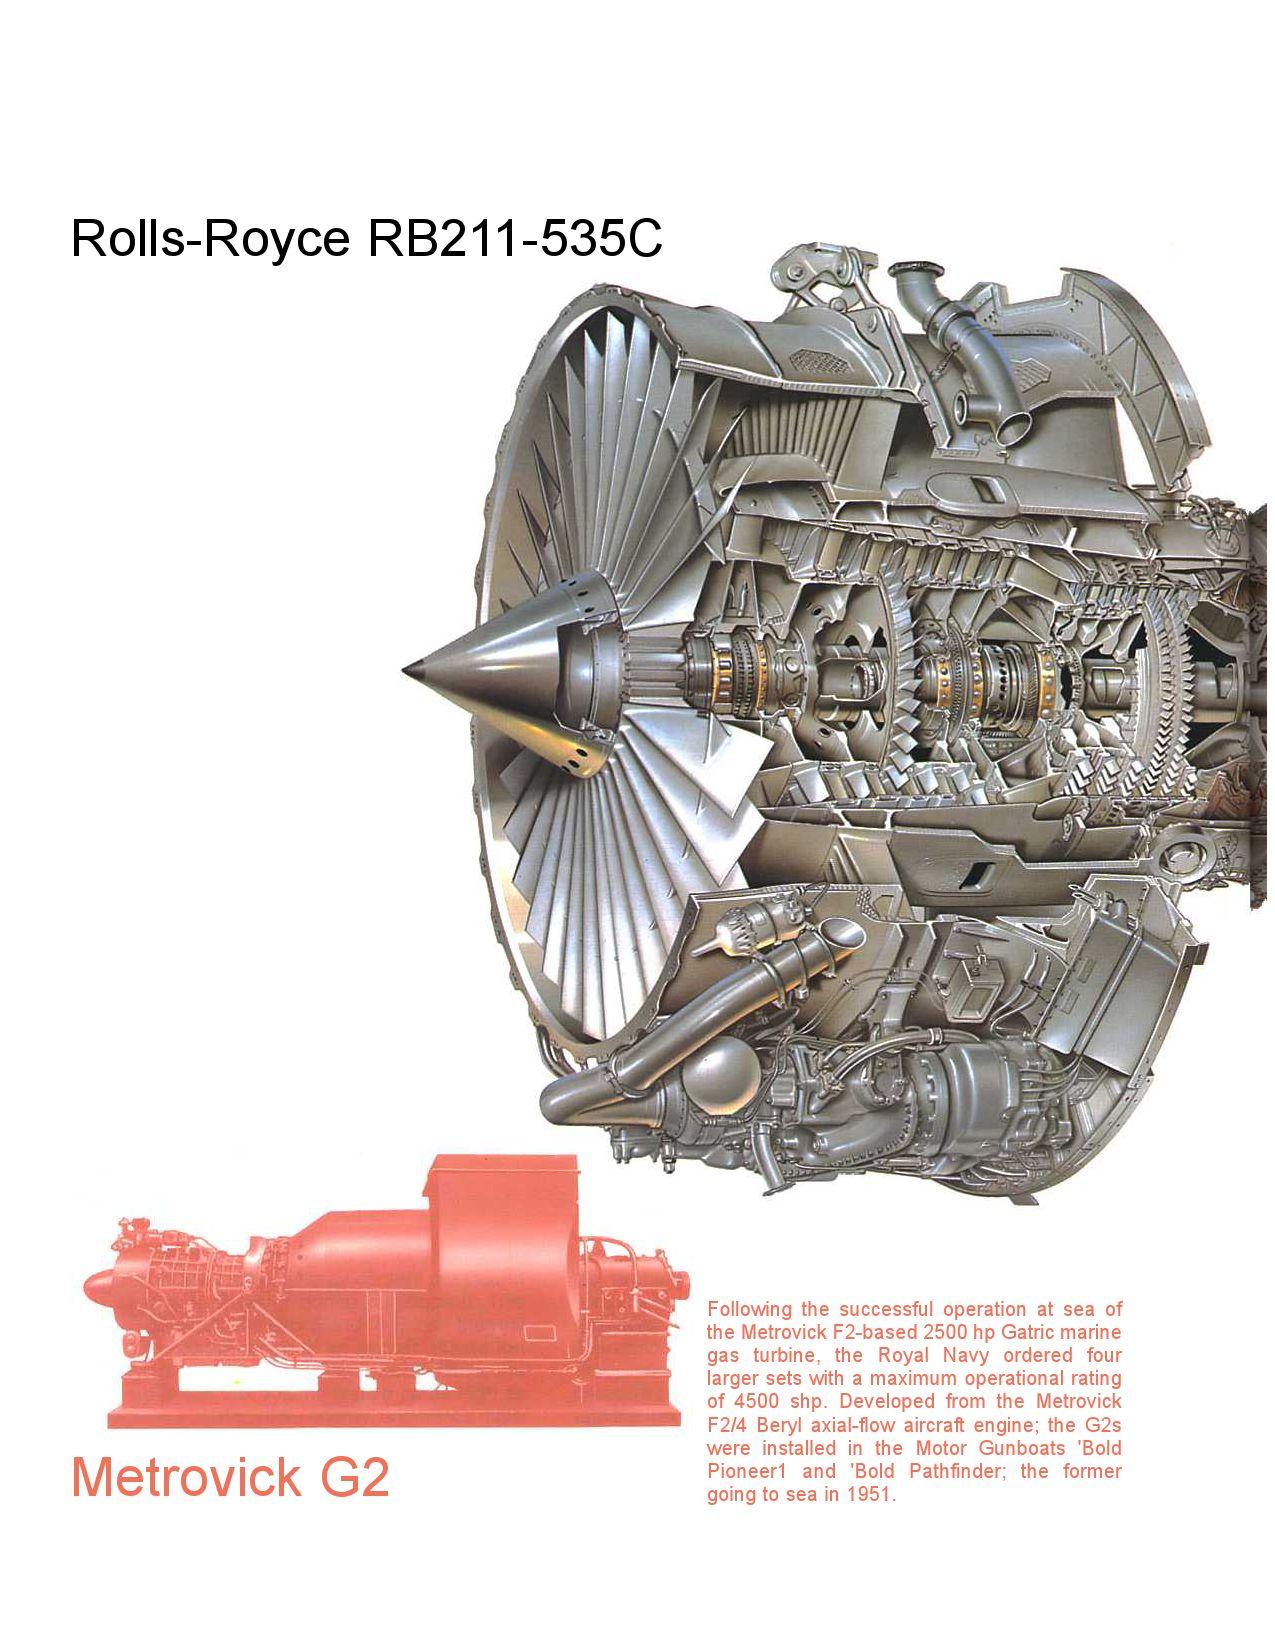 The Jet Engine qxd by Jean LuLu issuu